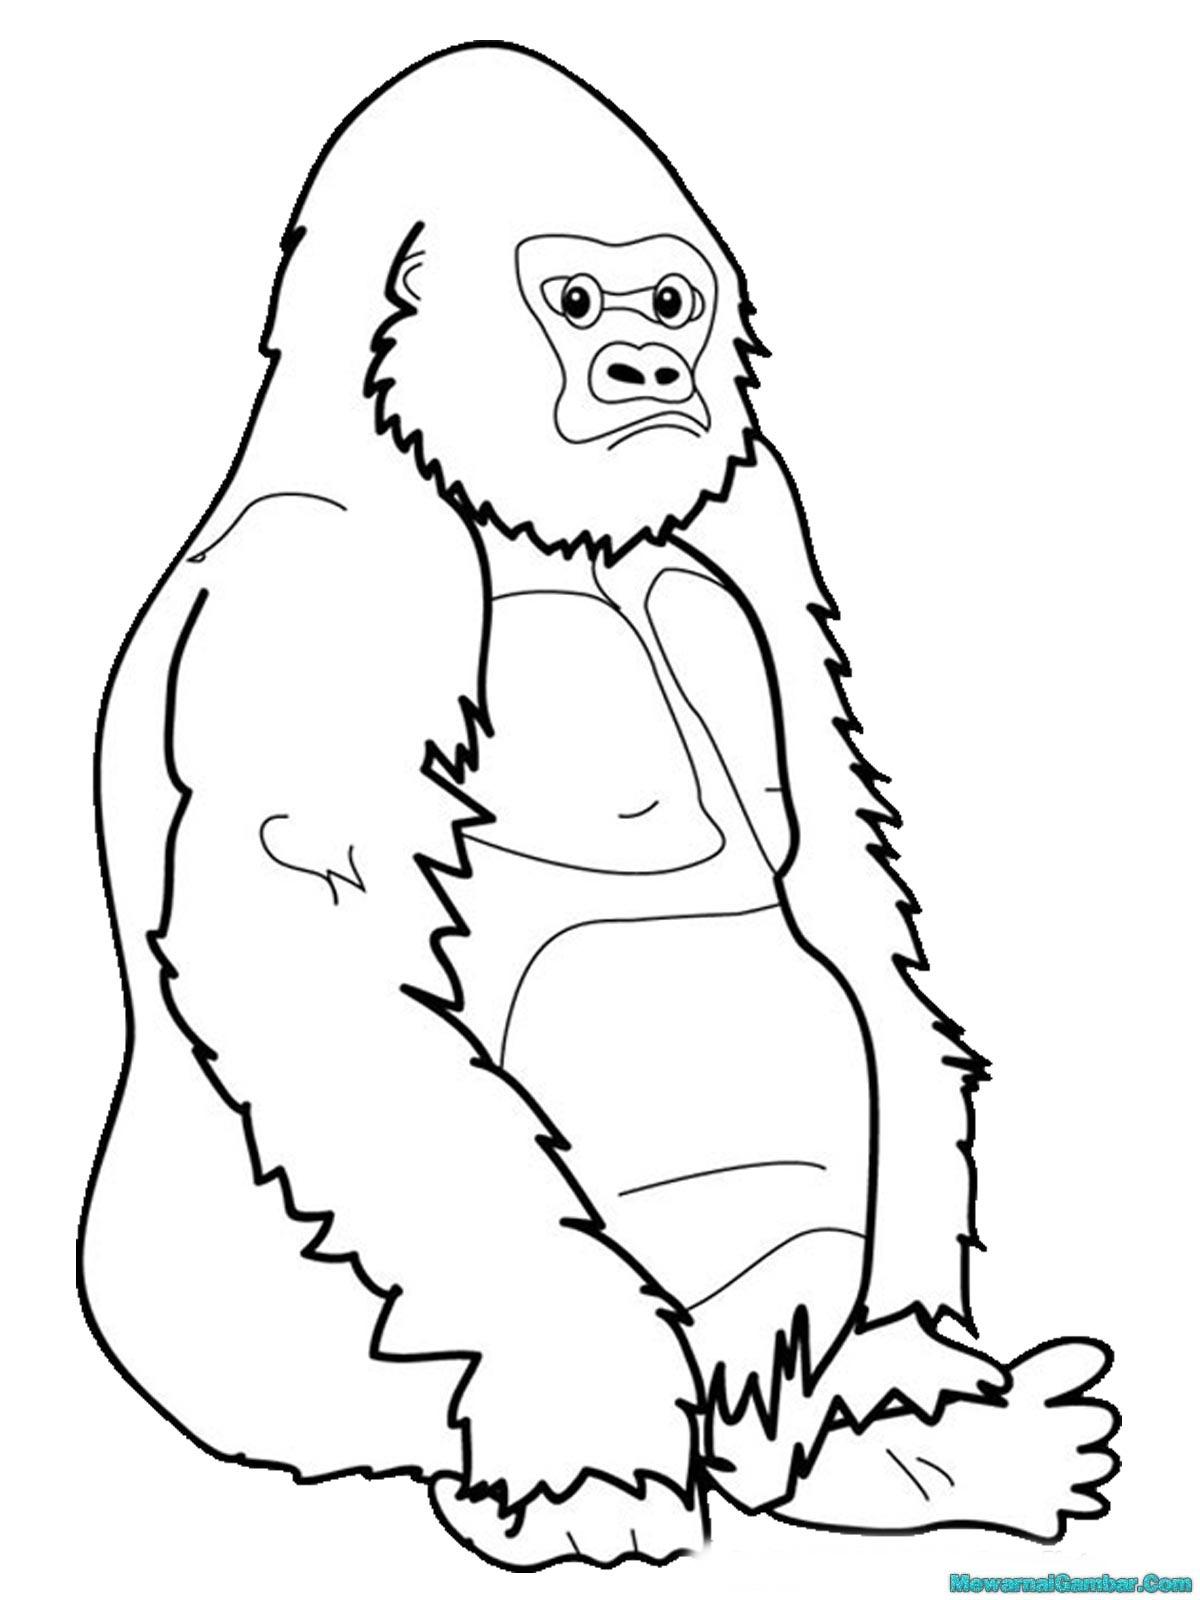 Mewarnai Gambar Gorila Di Hutan Belantara Mewarnai Gambar Raja Gorila Sedang Memperhatikan Anak Buahnya